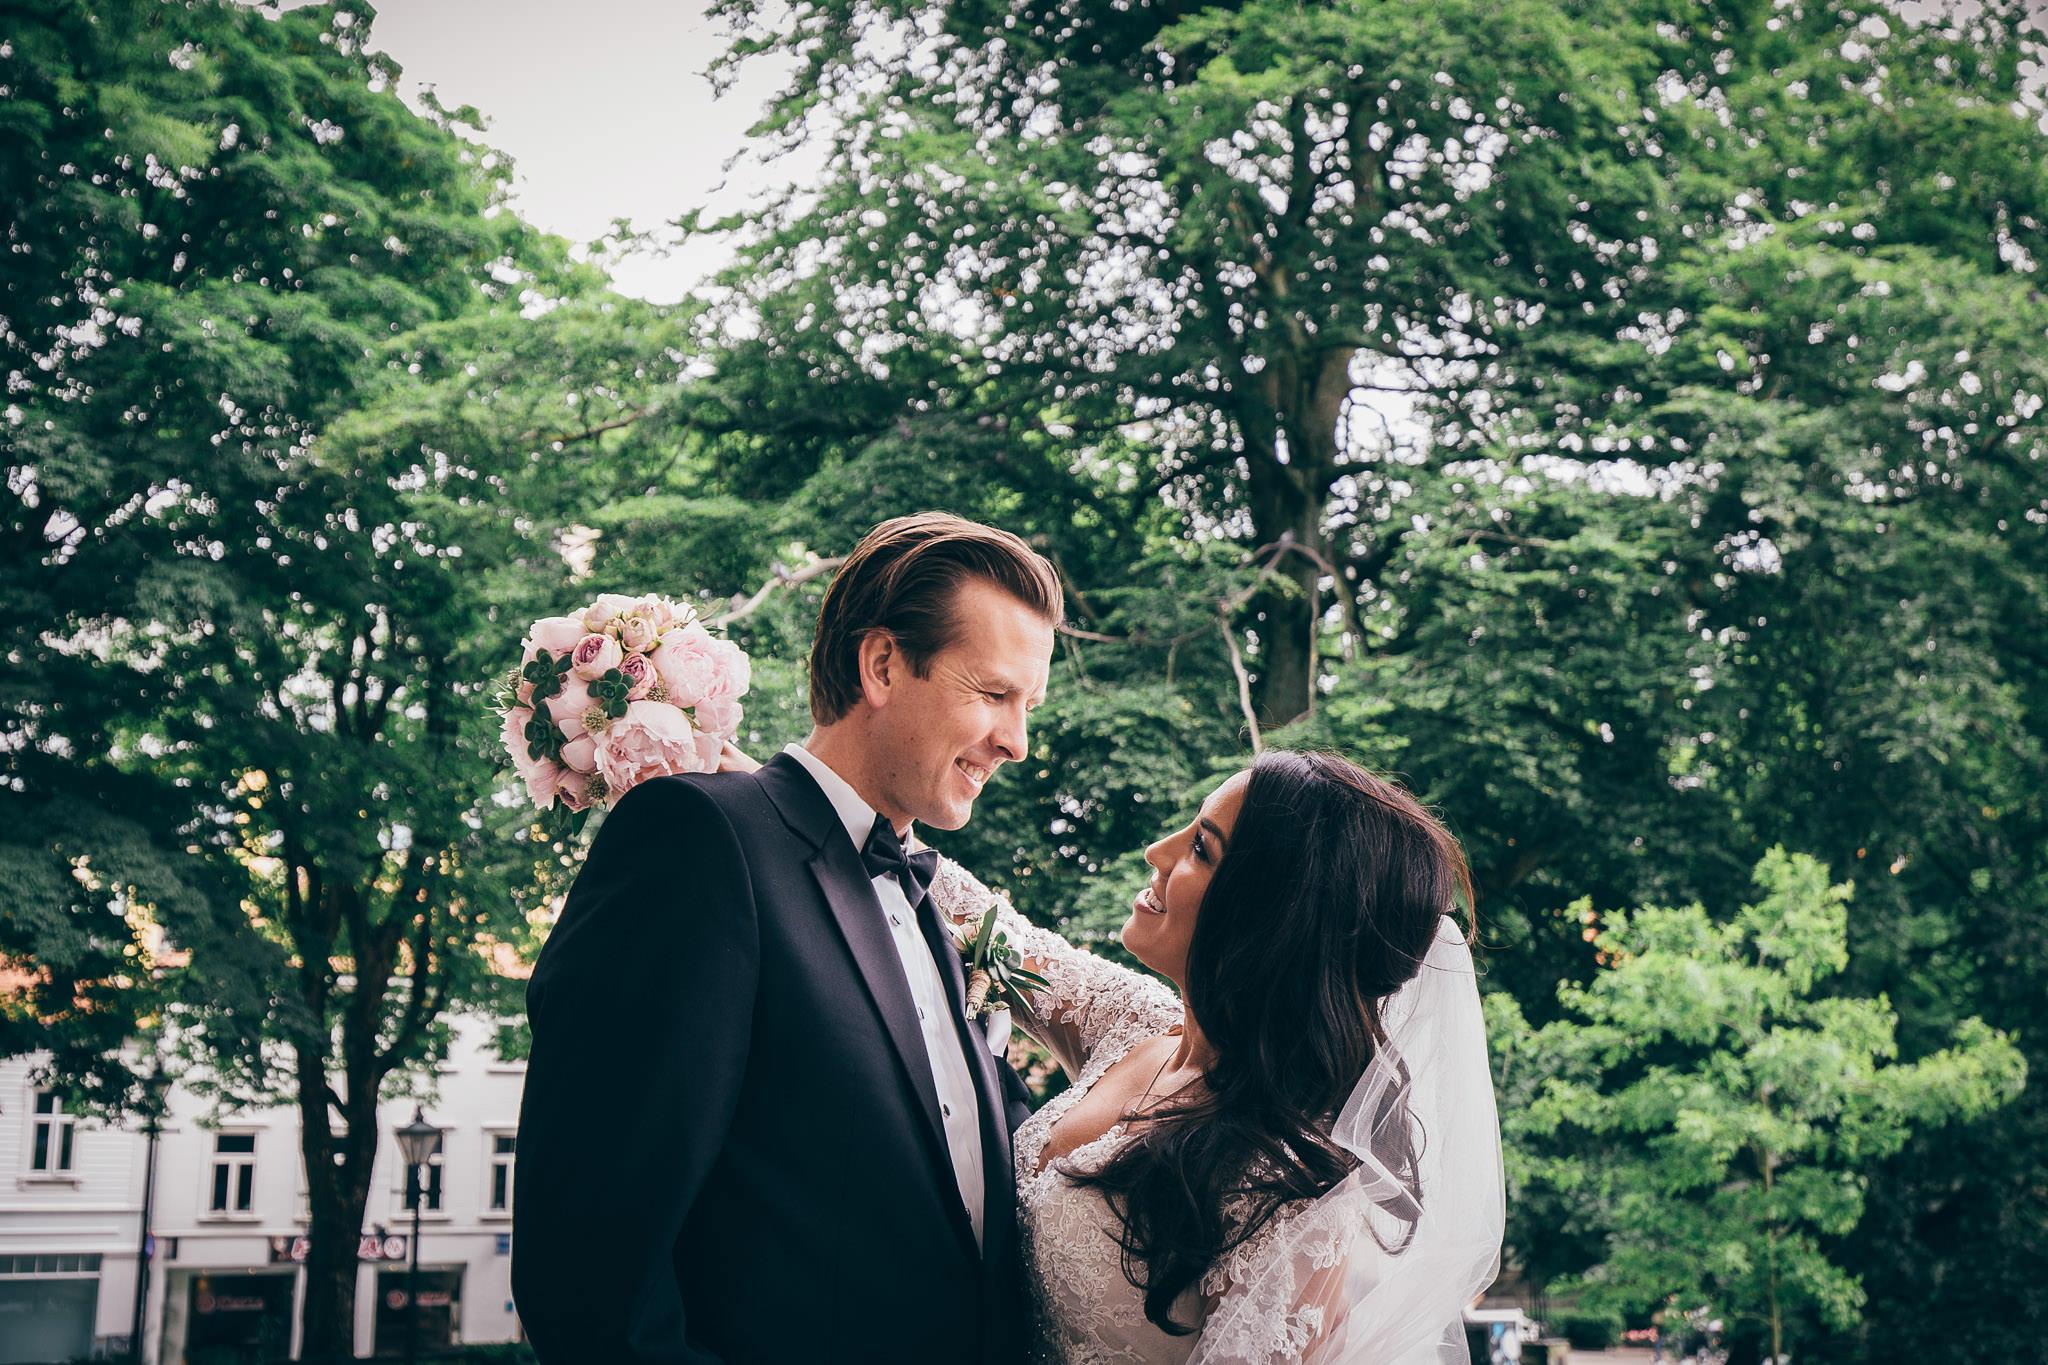 Wedding+Photographer+Norway+Bryllupsfotograf+Casey+Arneson+MK-148.jpg